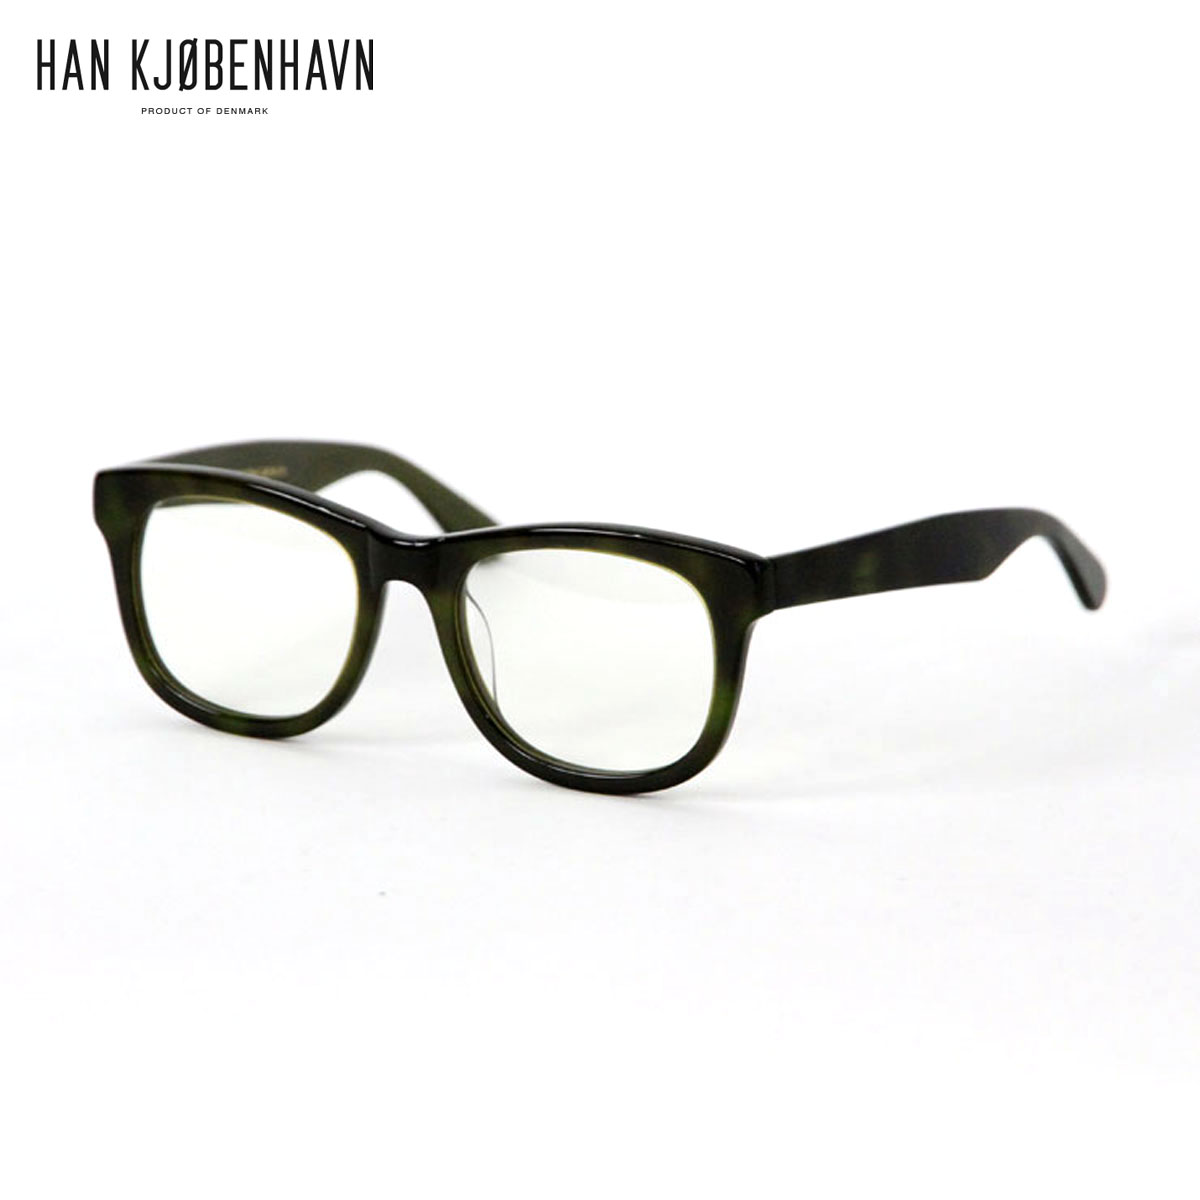 b06805bd609 Han HAN KJOBENHAVN authorized sale store sunglasses WOLFGANG Mash - CLEAR  20P03Dec16